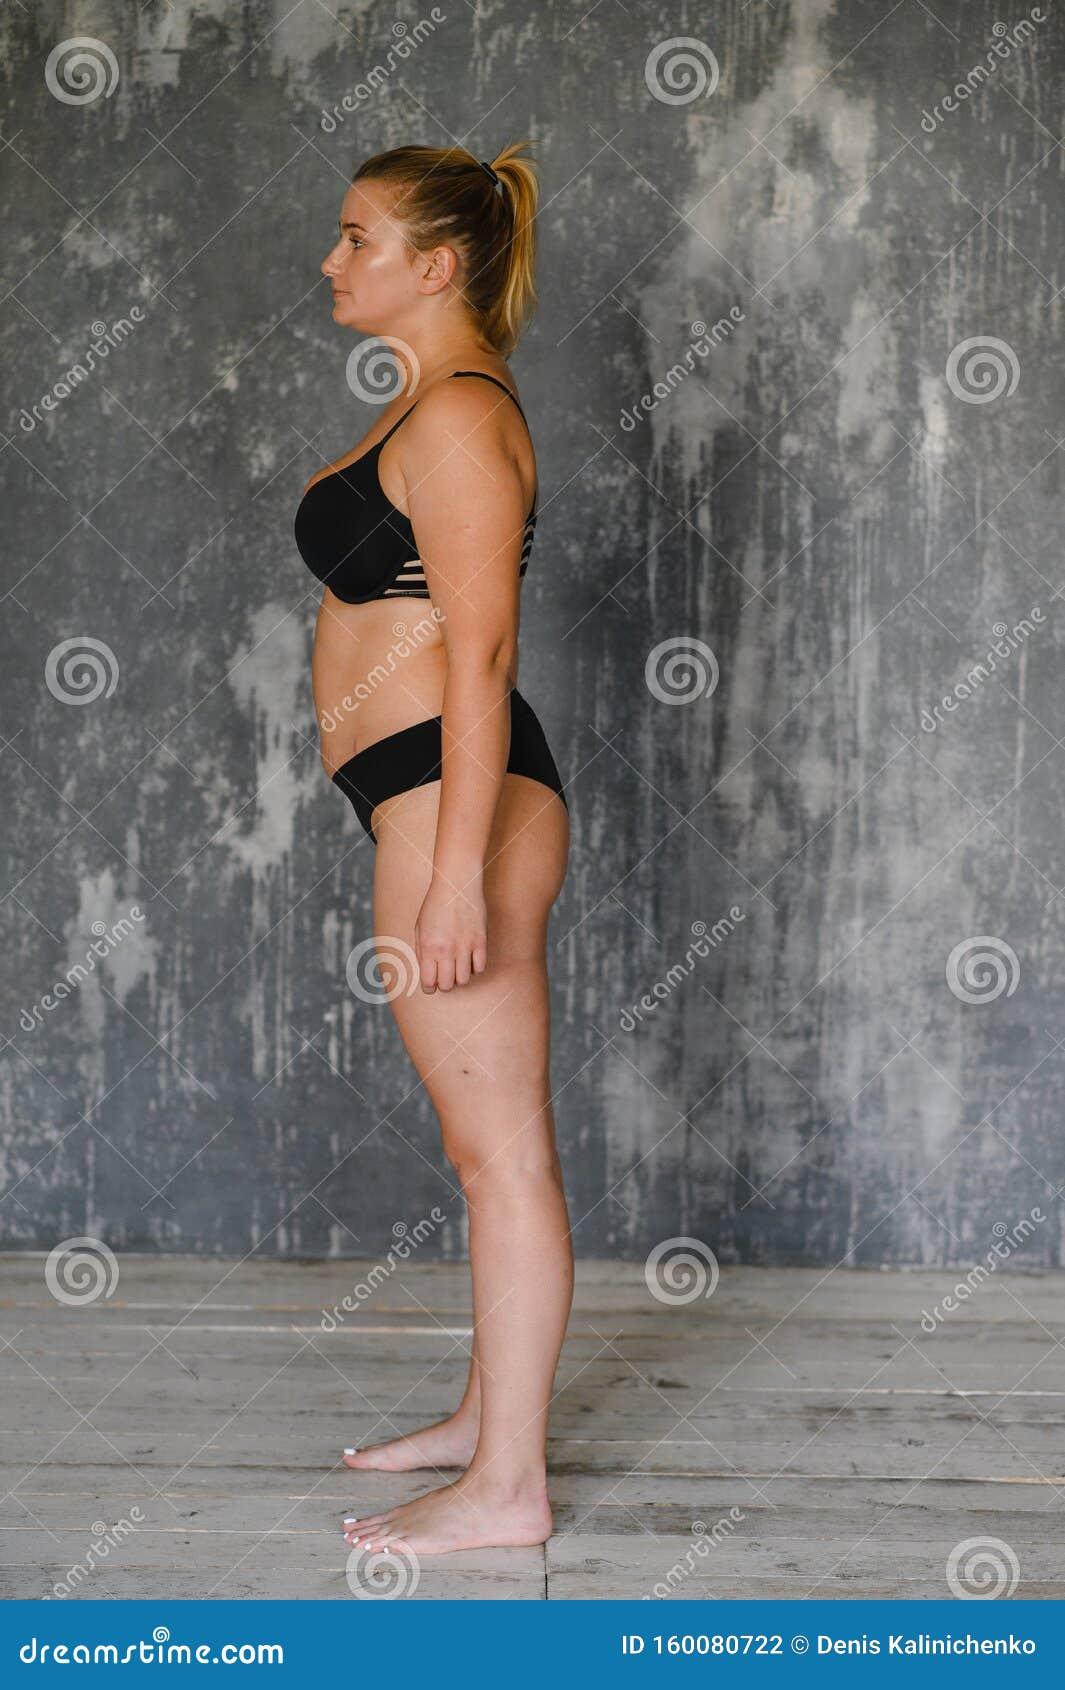 Denise richards naked pics